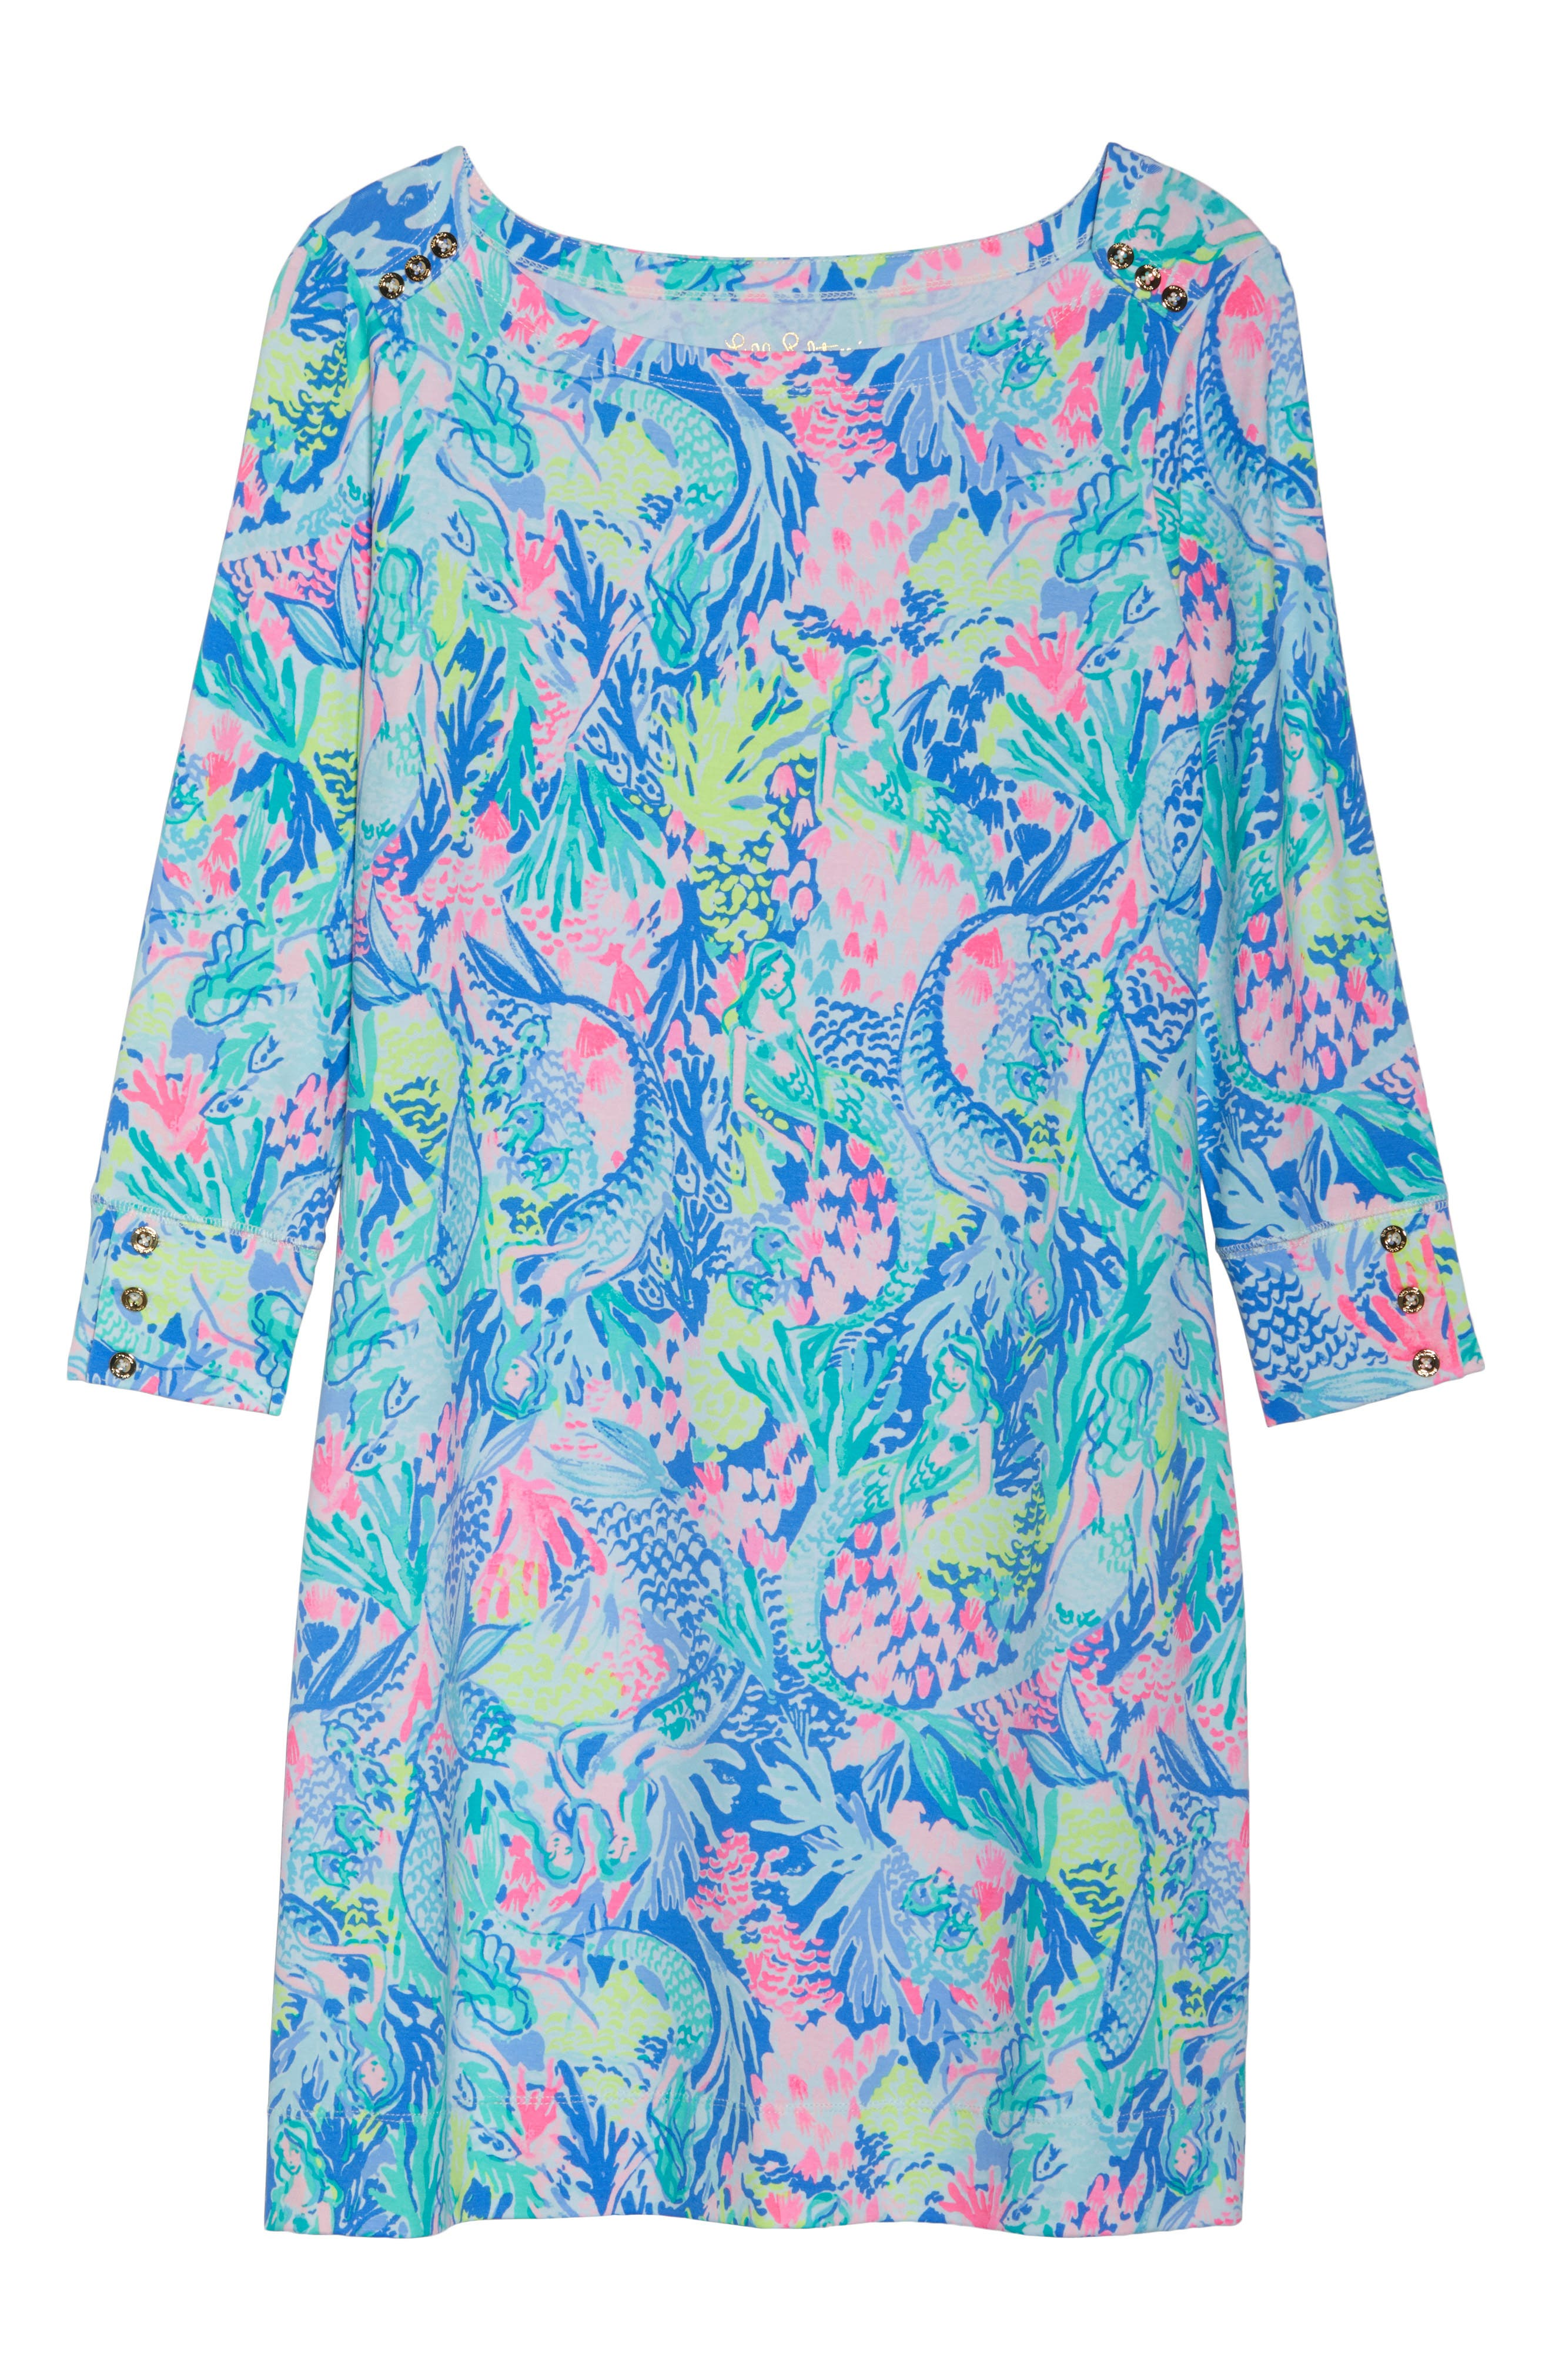 Sophie UPF 50+ Shift Dress,                             Alternate thumbnail 6, color,                             Multi Mermaids Cove